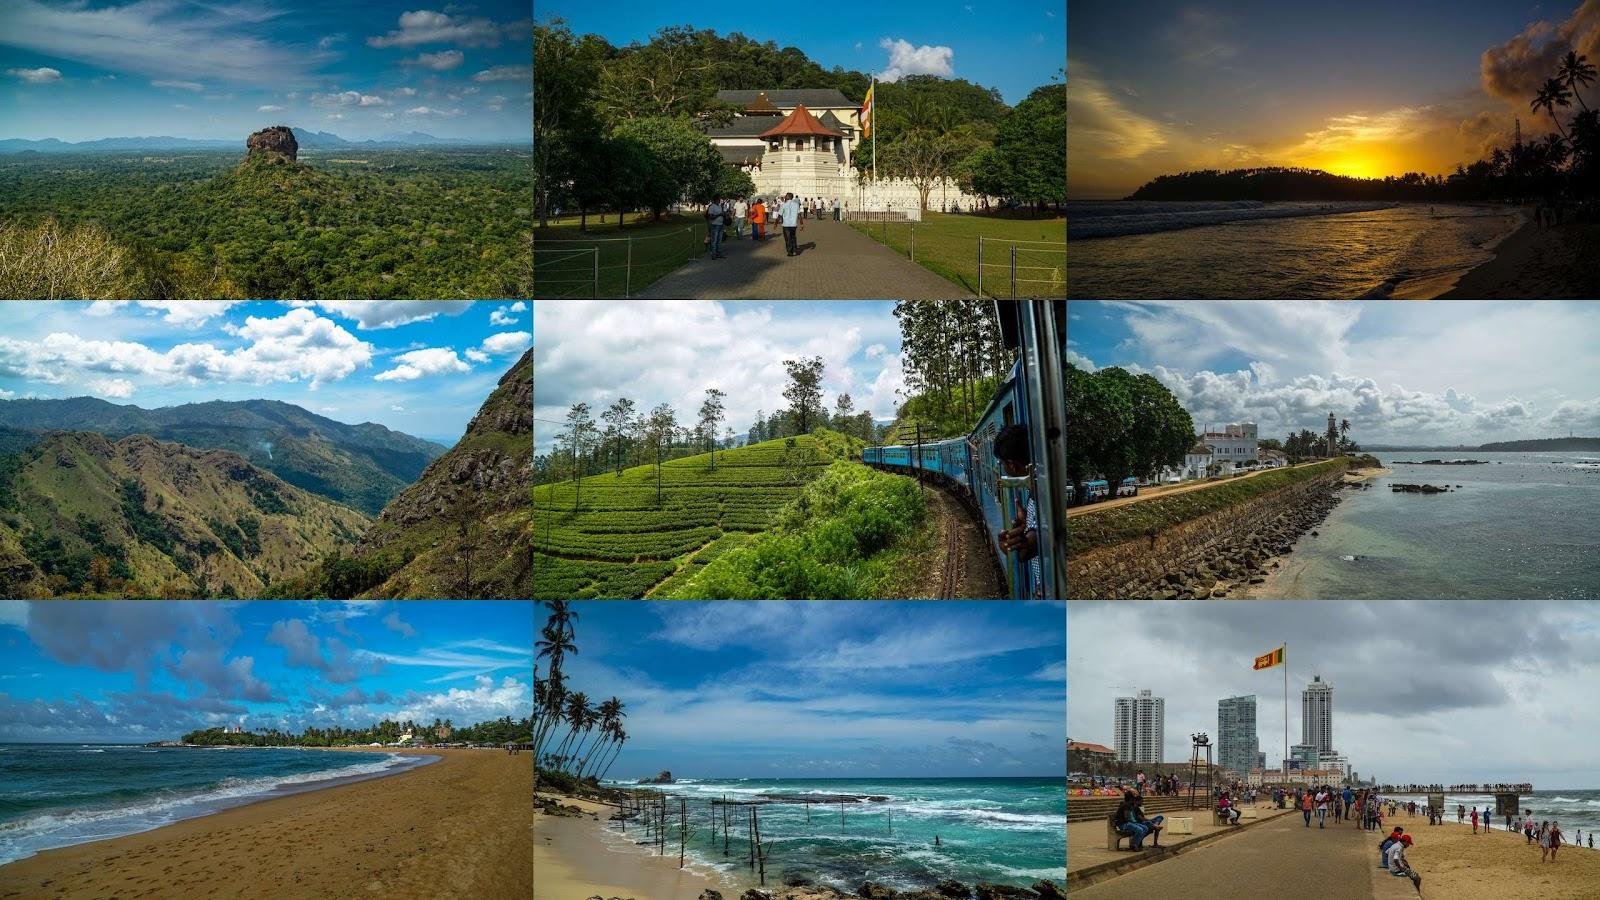 sri lanka itinerary 10 days eat travel photography rh gaeria84 blogspot com